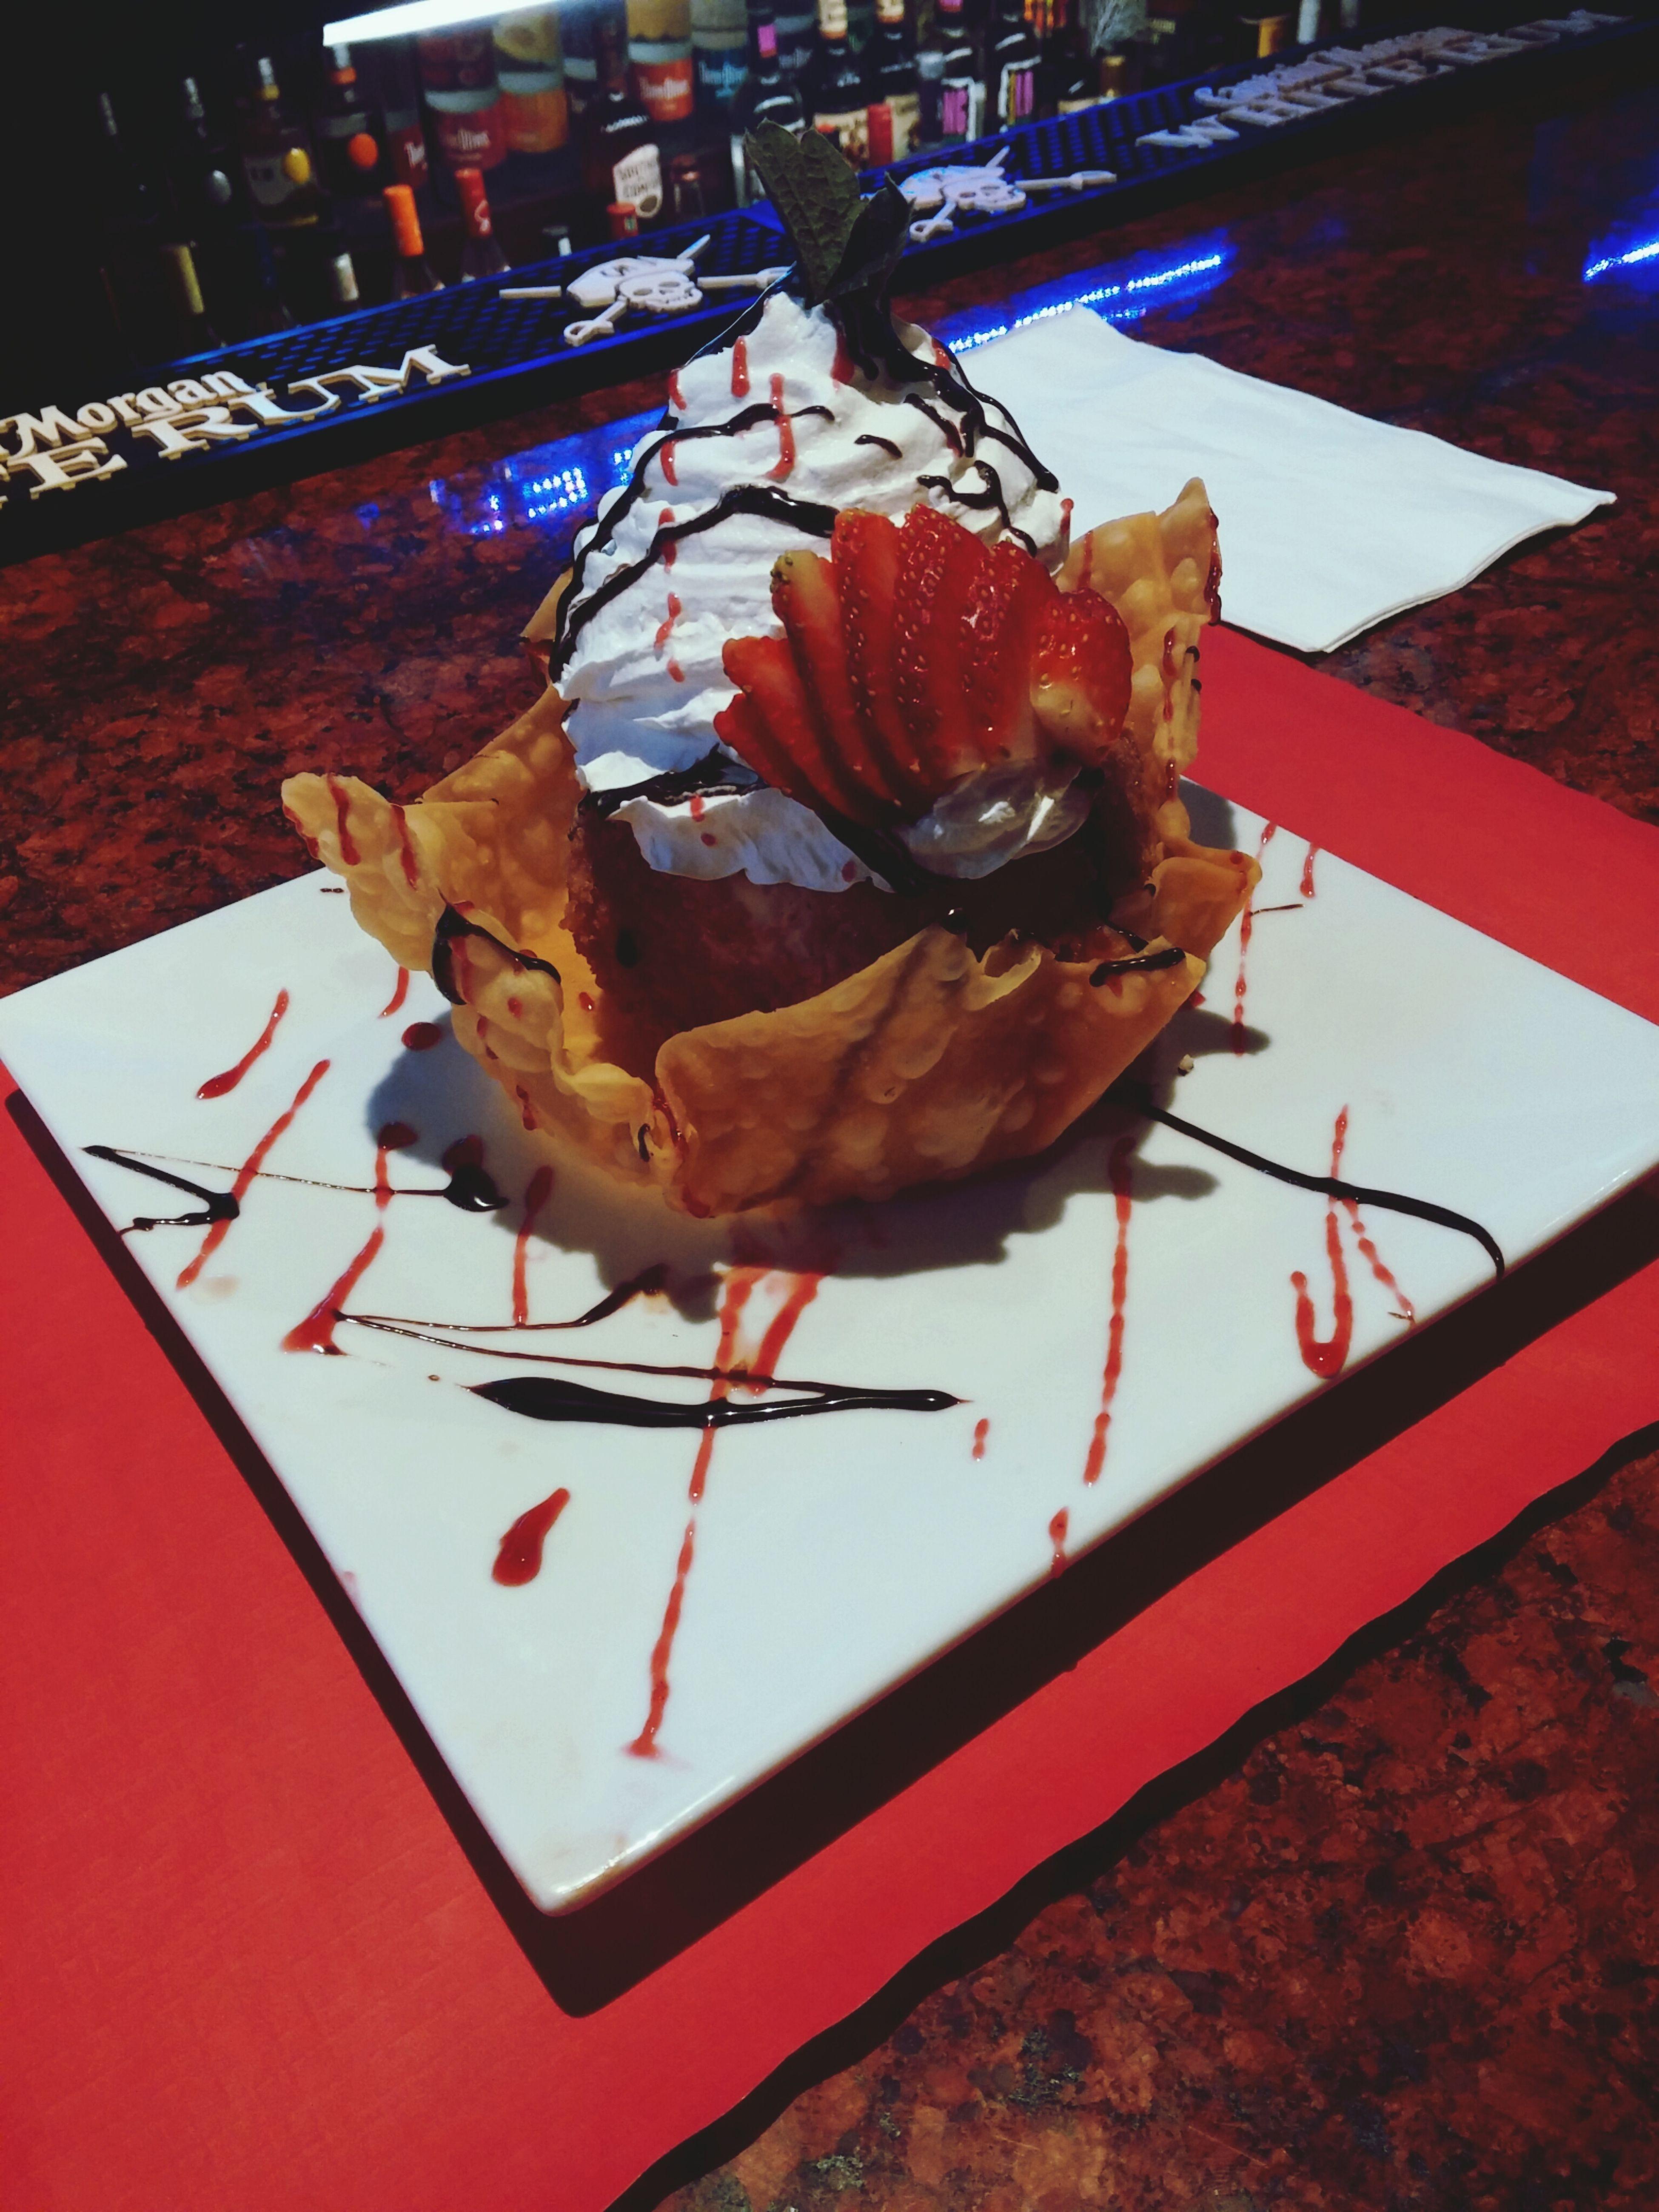 Fried Ice Cream Deep Fried Ice Cream Ice Cream Bar